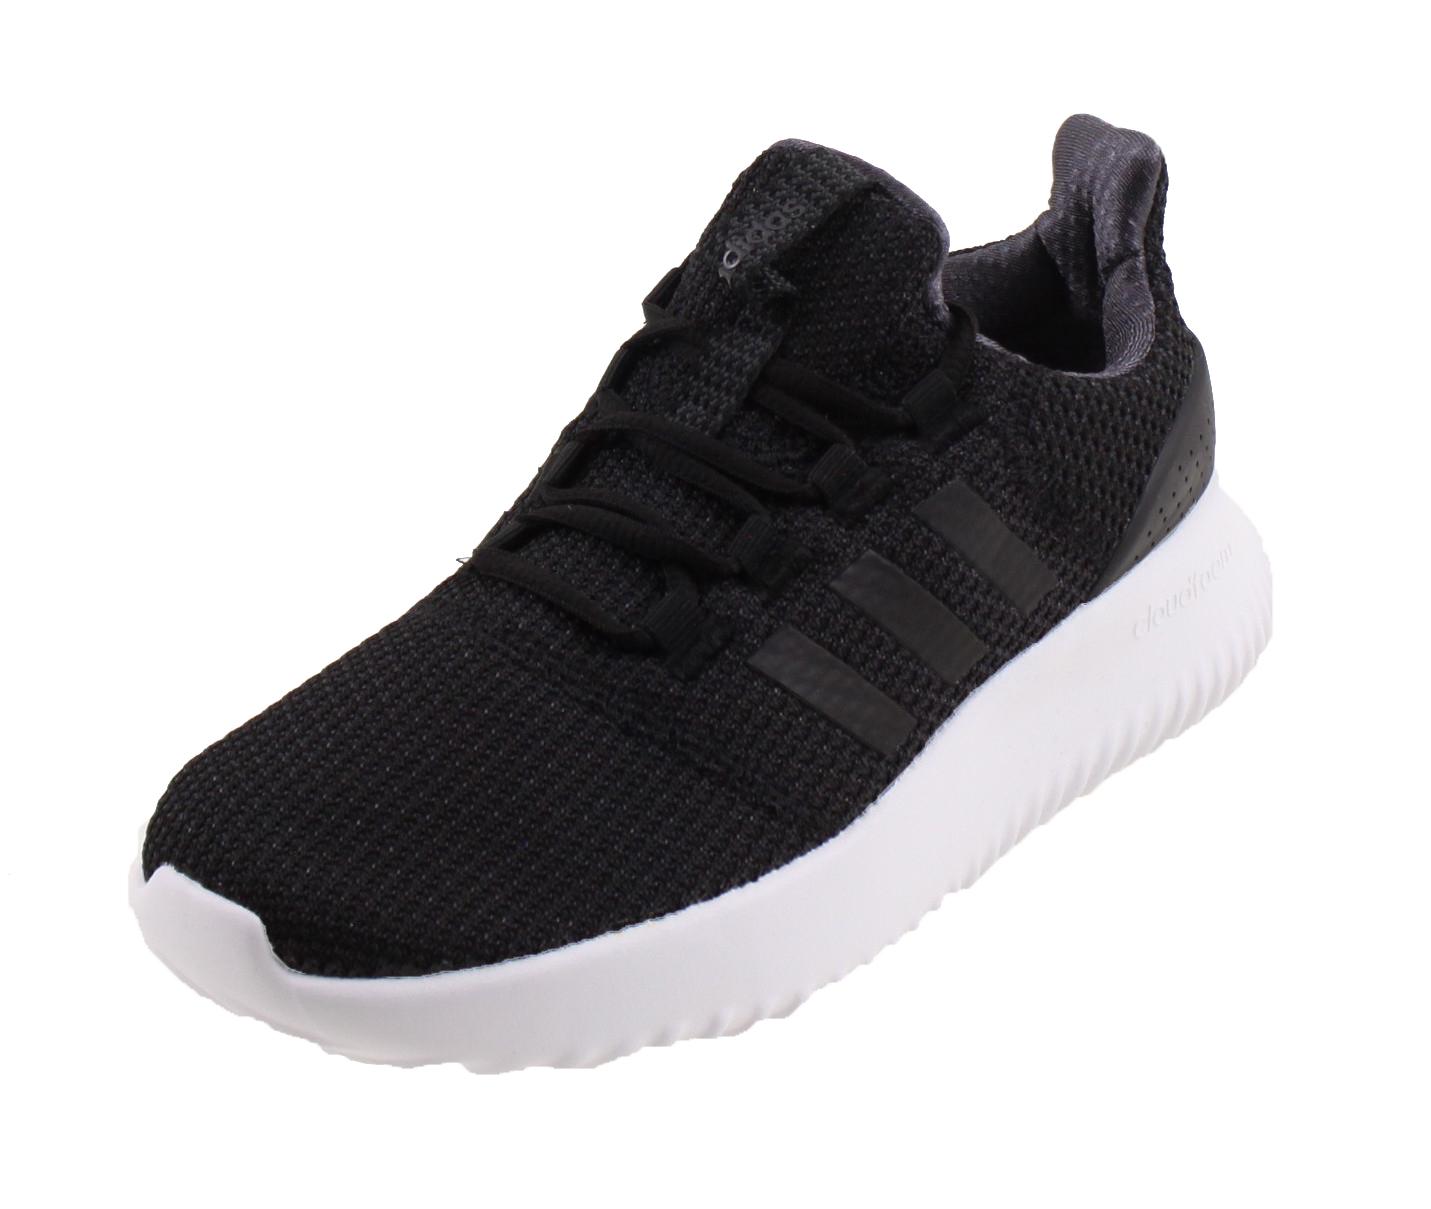 1db7a7fccec Adidas CLOUDFOAM ULTIMATE ZWART online kopen bij Sportpaleis.